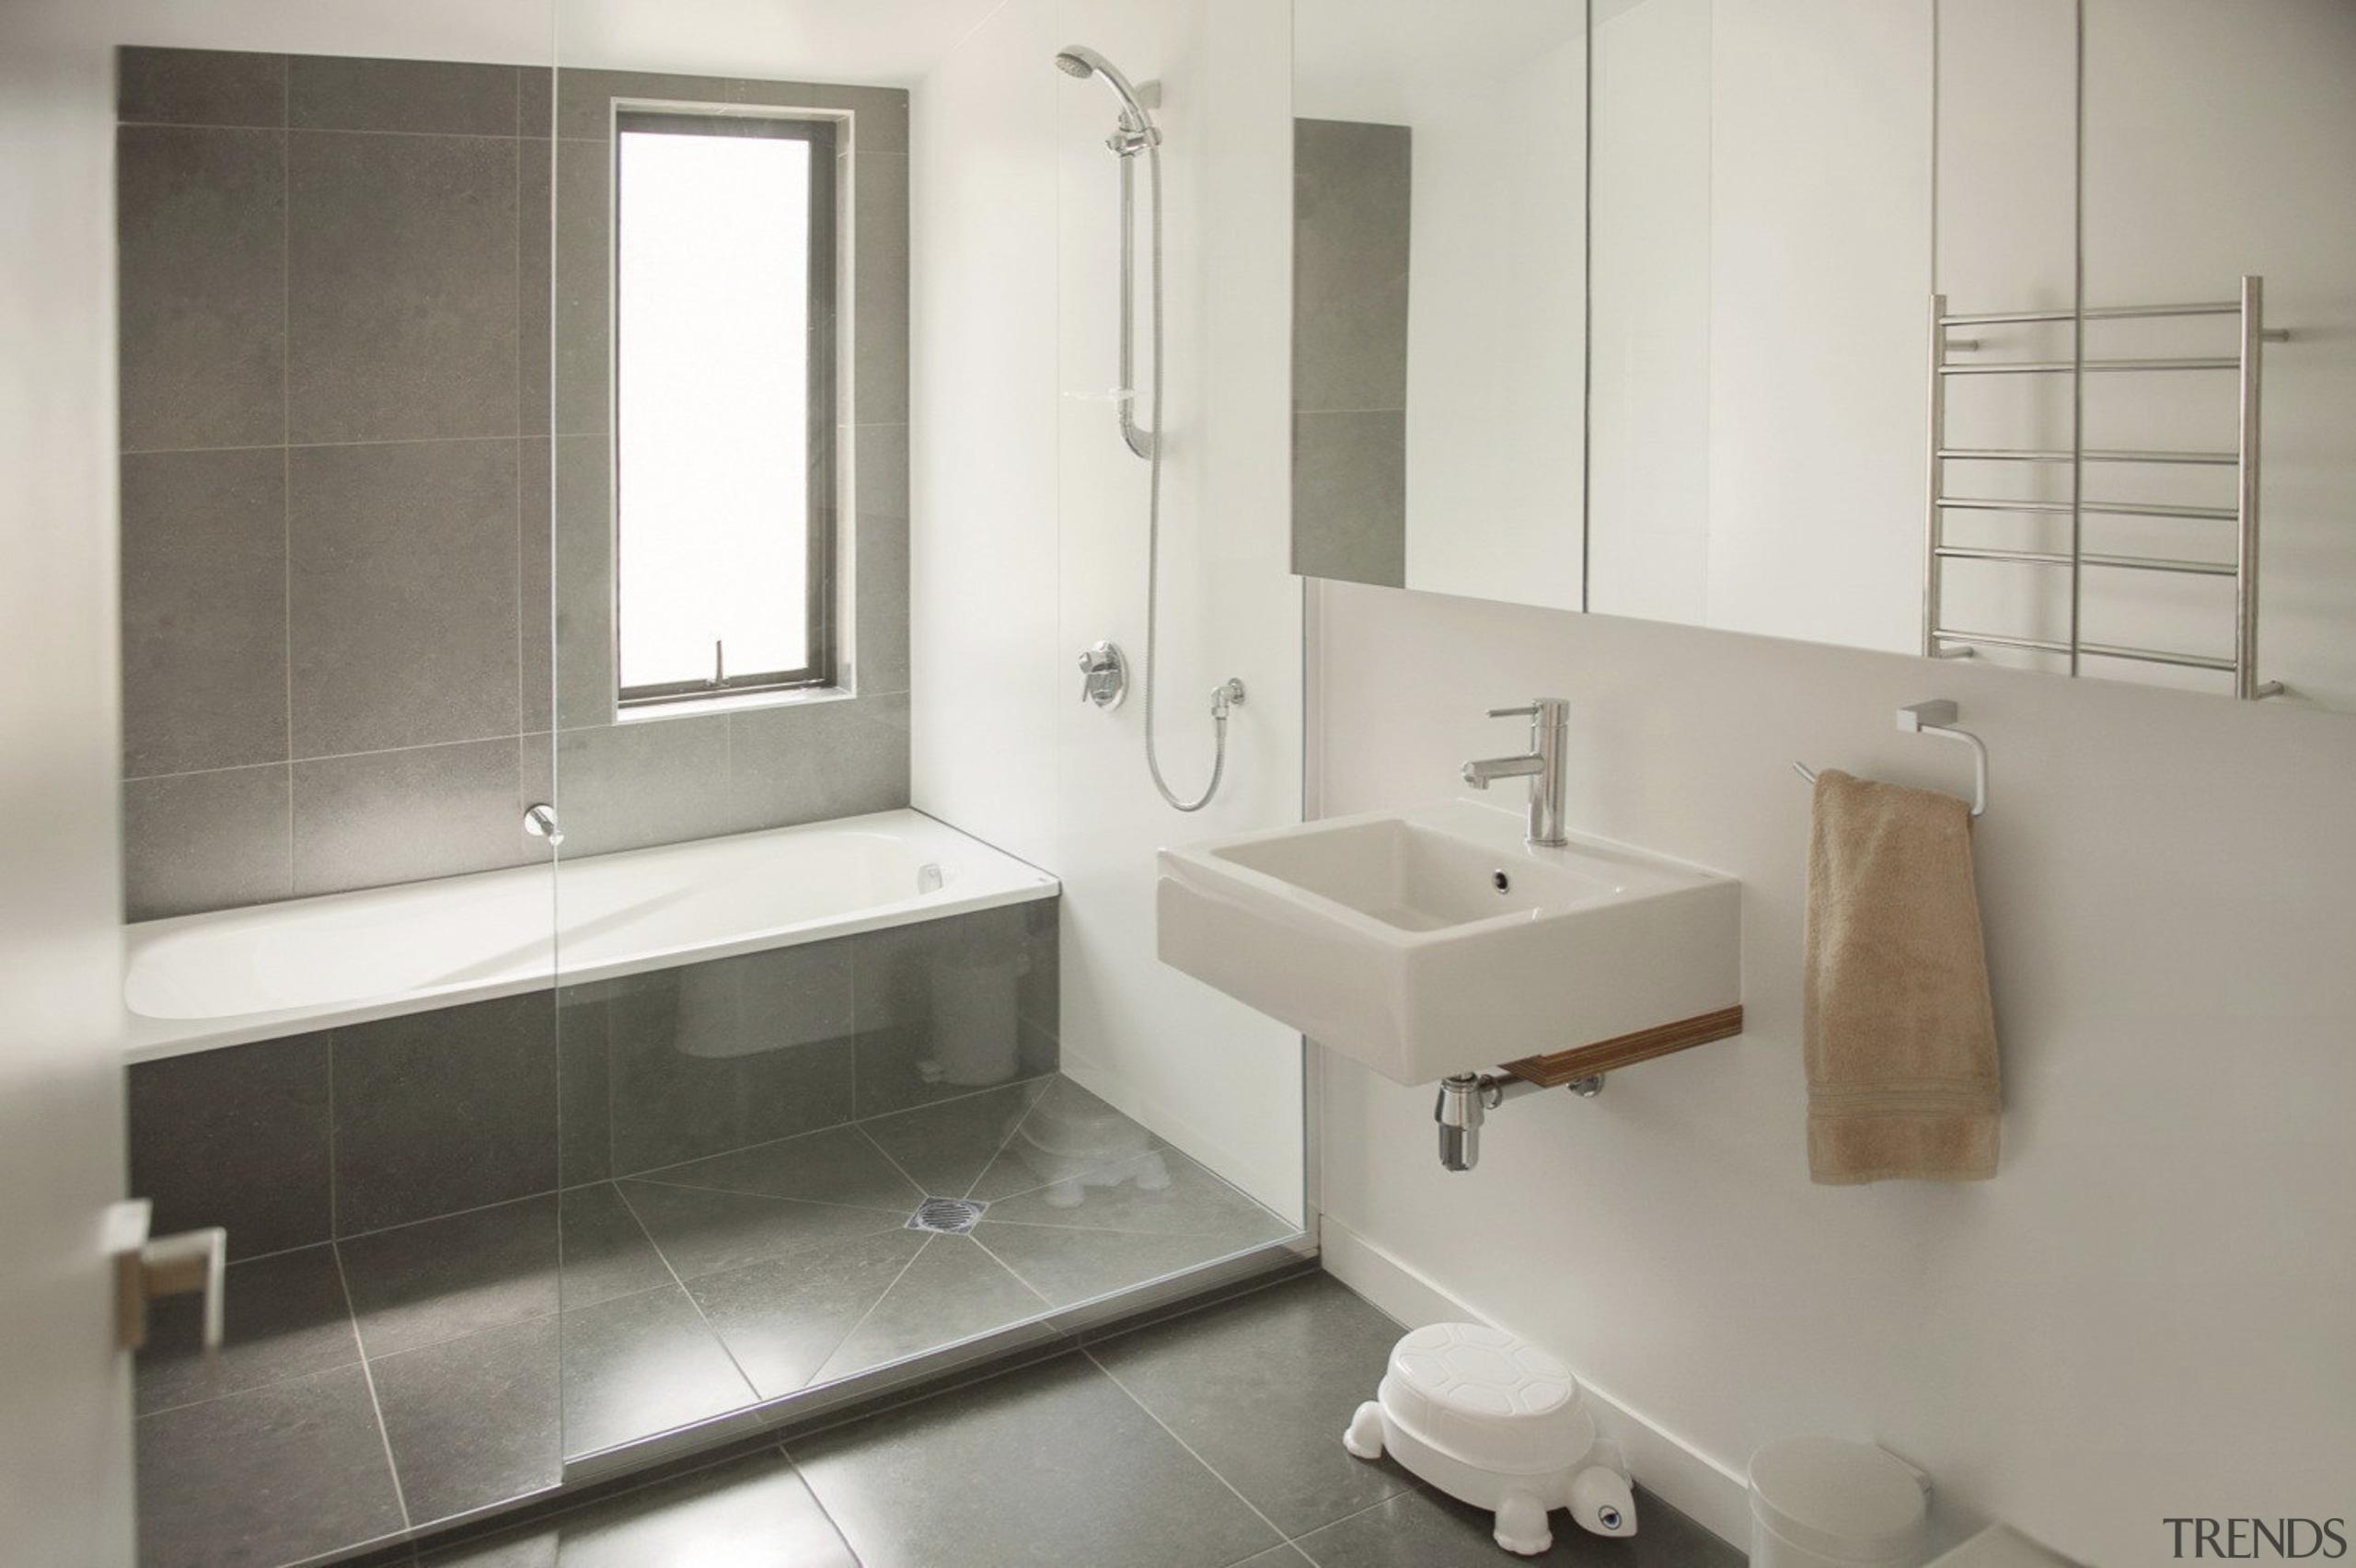 City meets country at Karaka Lakes - City bathroom, bathroom accessory, floor, interior design, plumbing fixture, product design, property, room, sink, tap, tile, gray